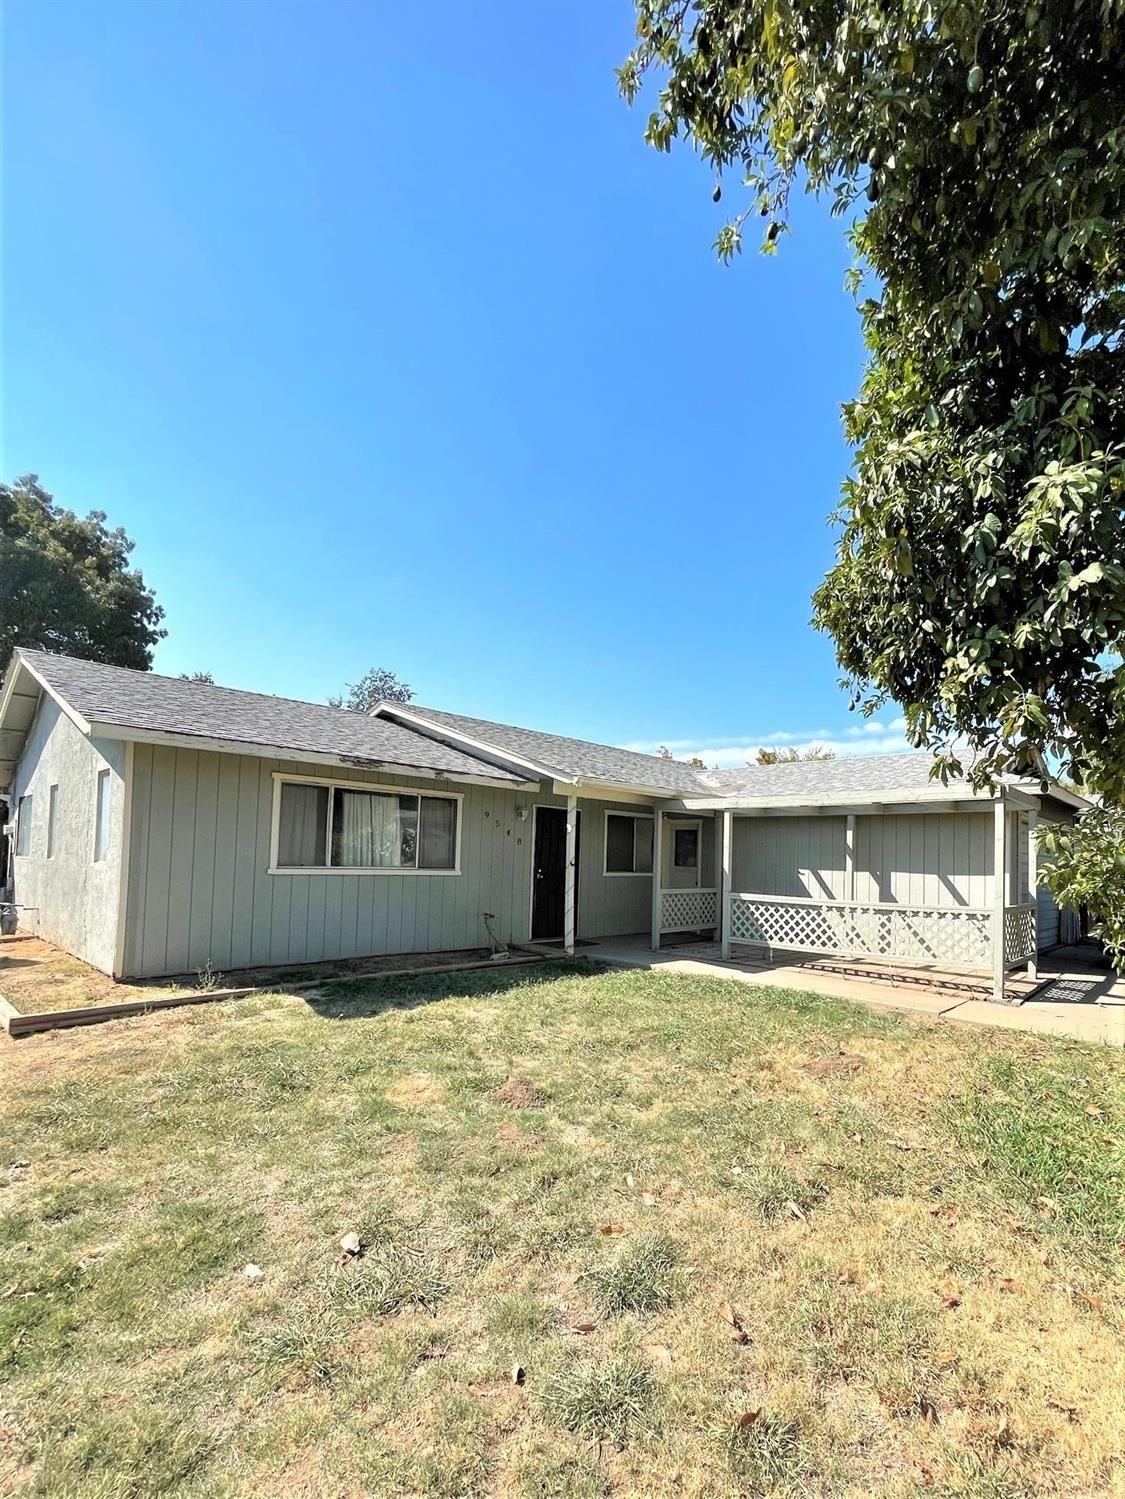 9548 Center Street, Live Oak, CA 95953 - #: 221105416